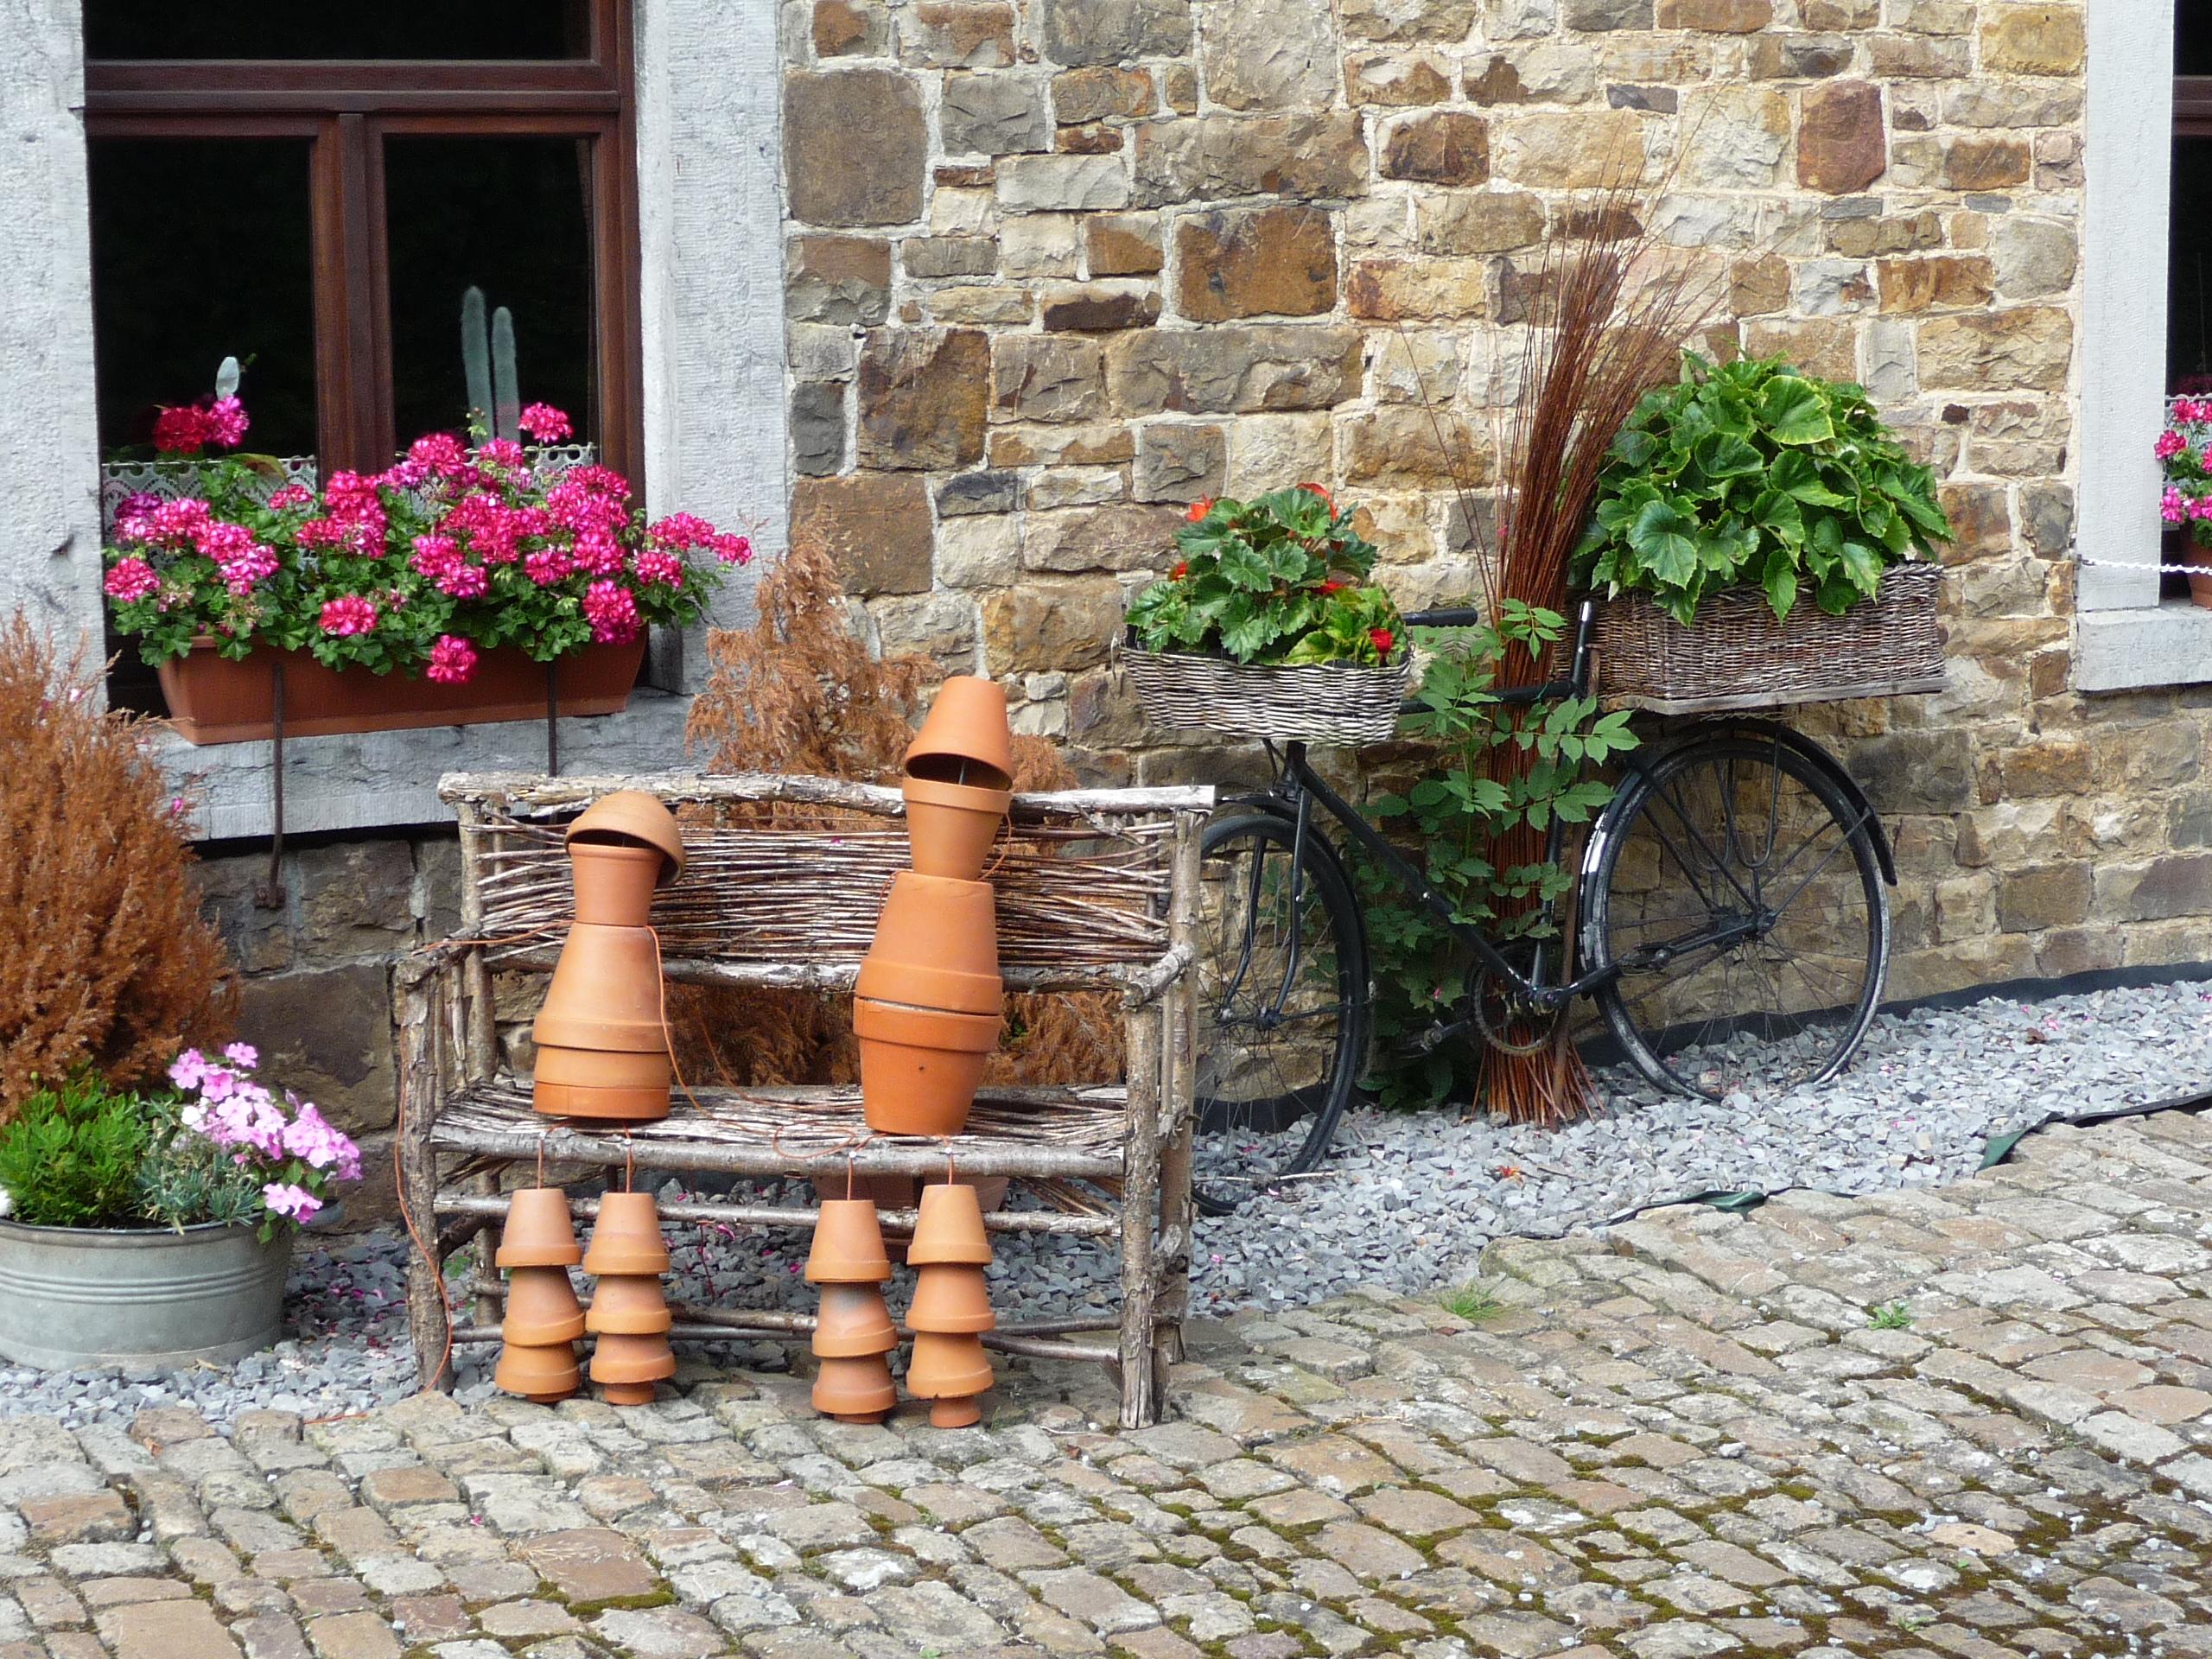 Flowerpot men in Erezee